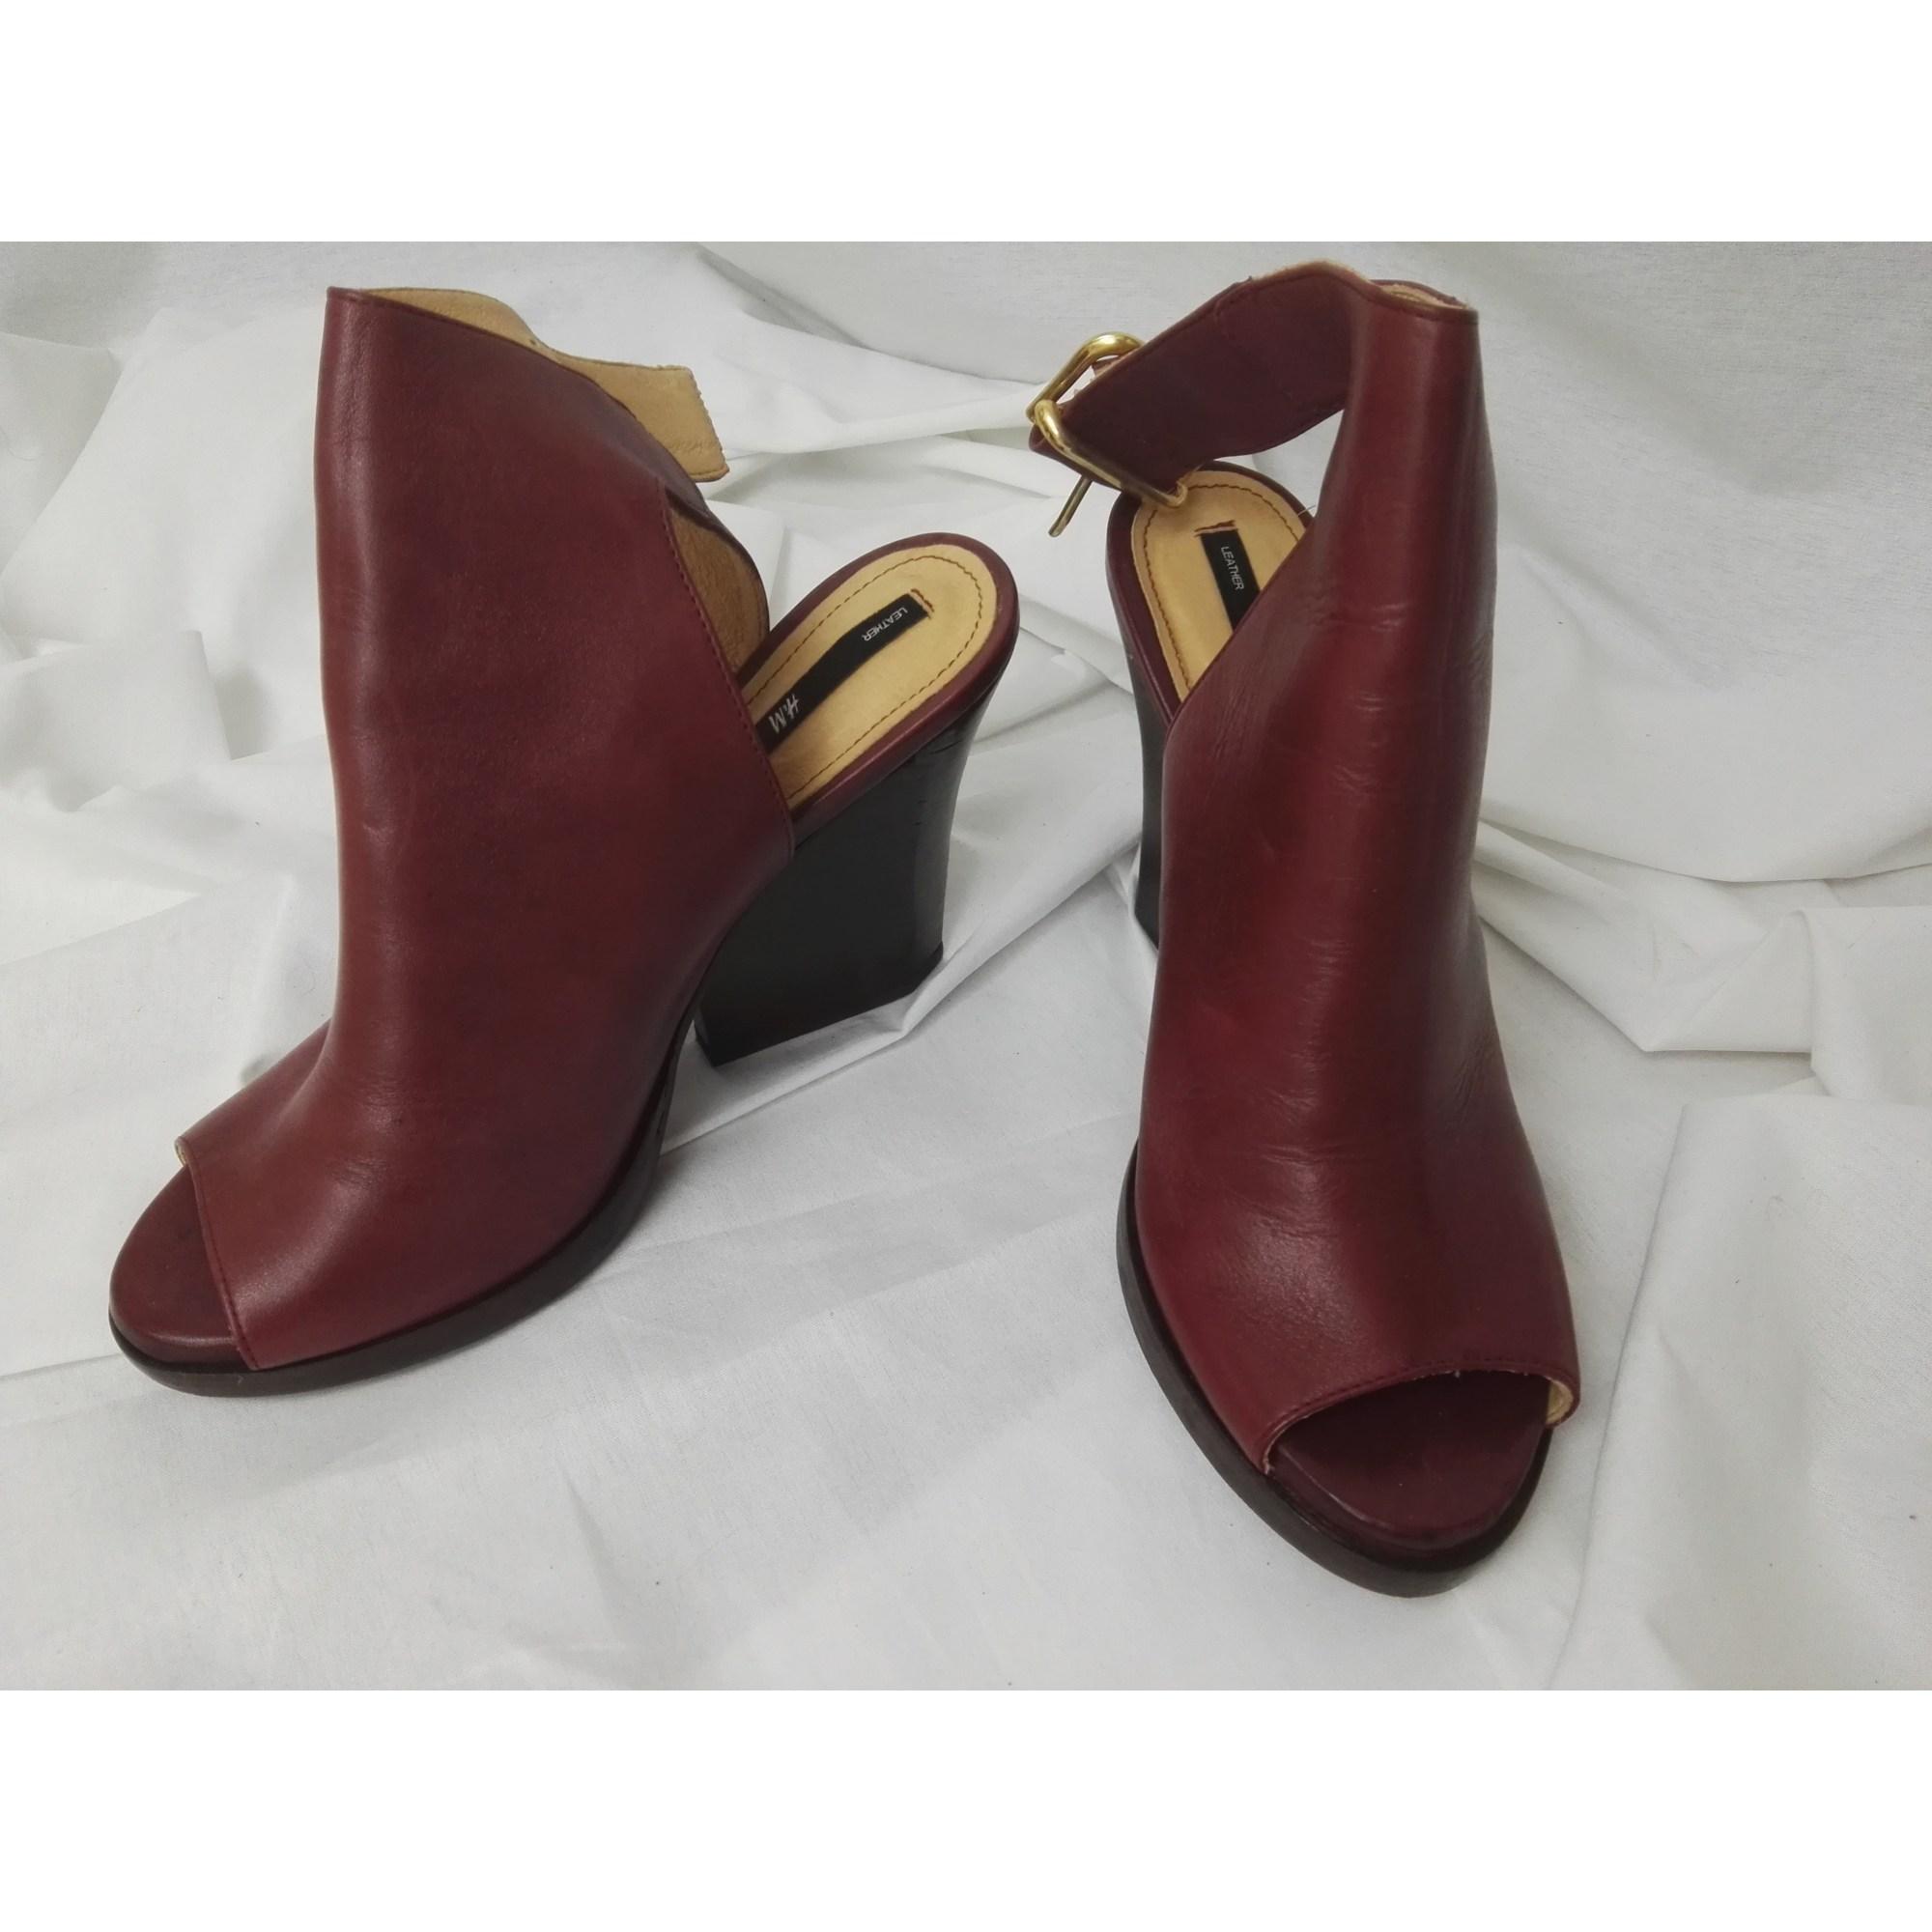 Bottines Low Boots A Talons H M 40 Rouge 4510826